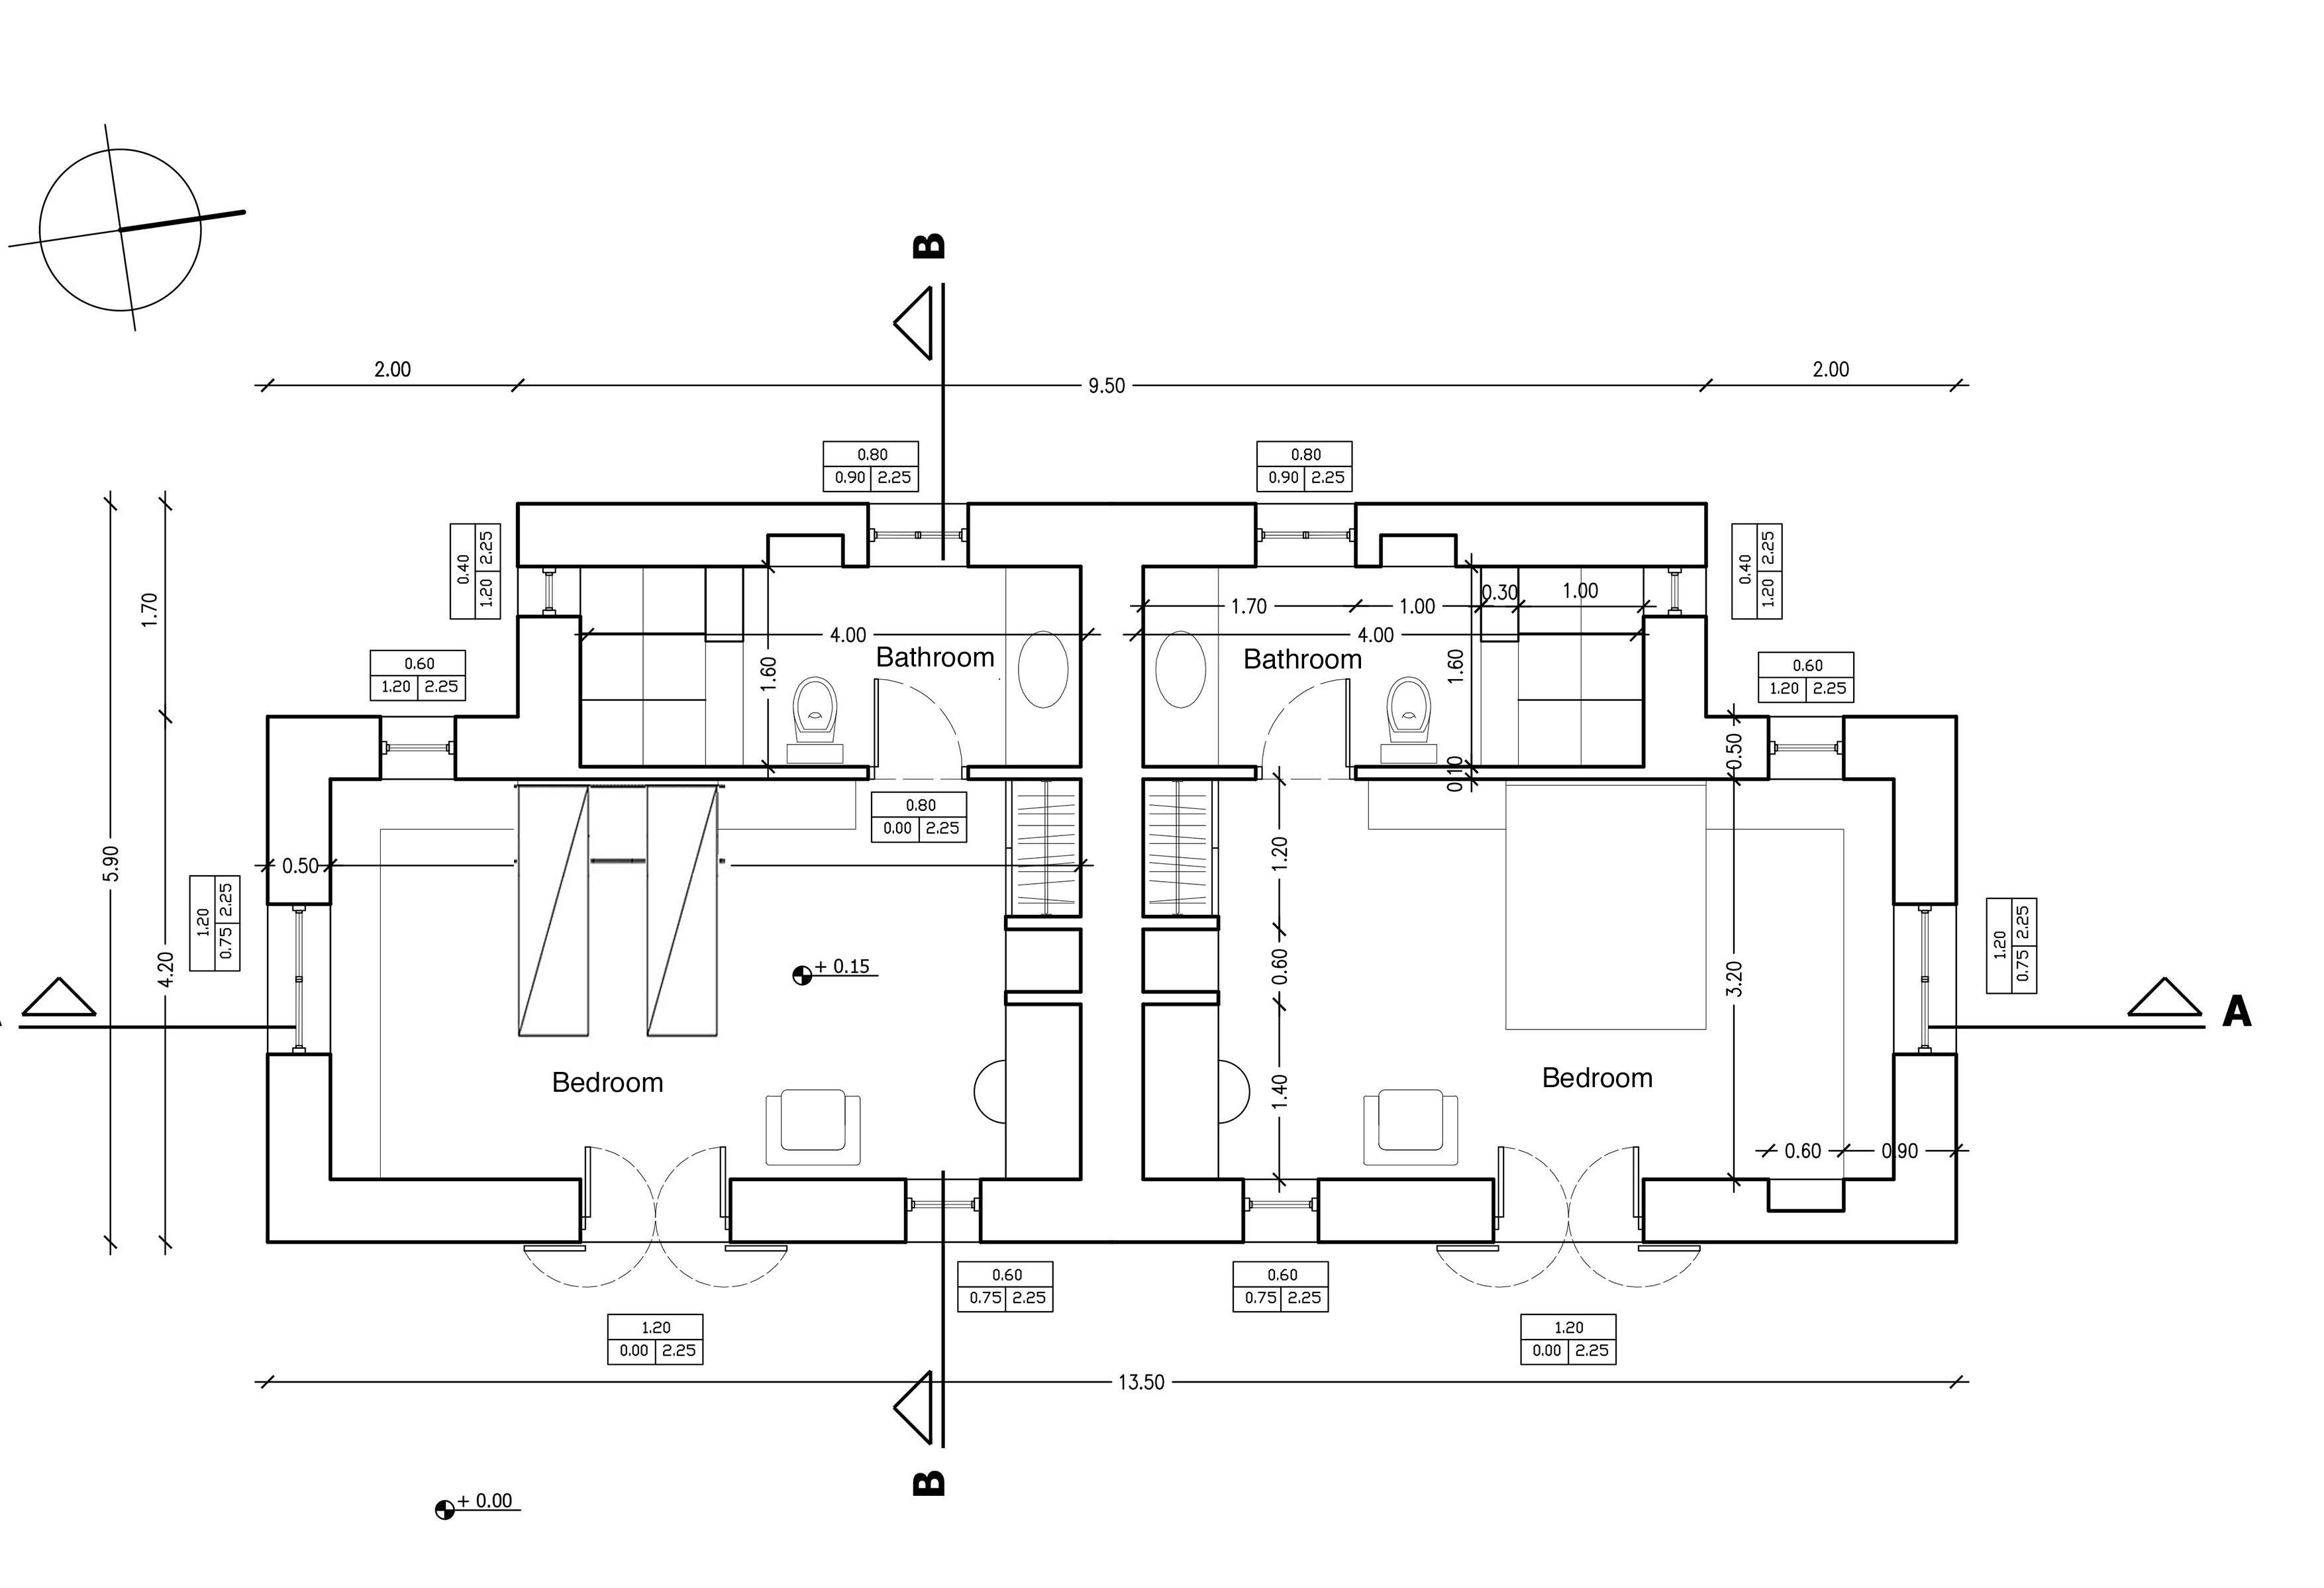 Cool Guest Cottages Floor Plans Largest Home Design Picture Inspirations Pitcheantrous